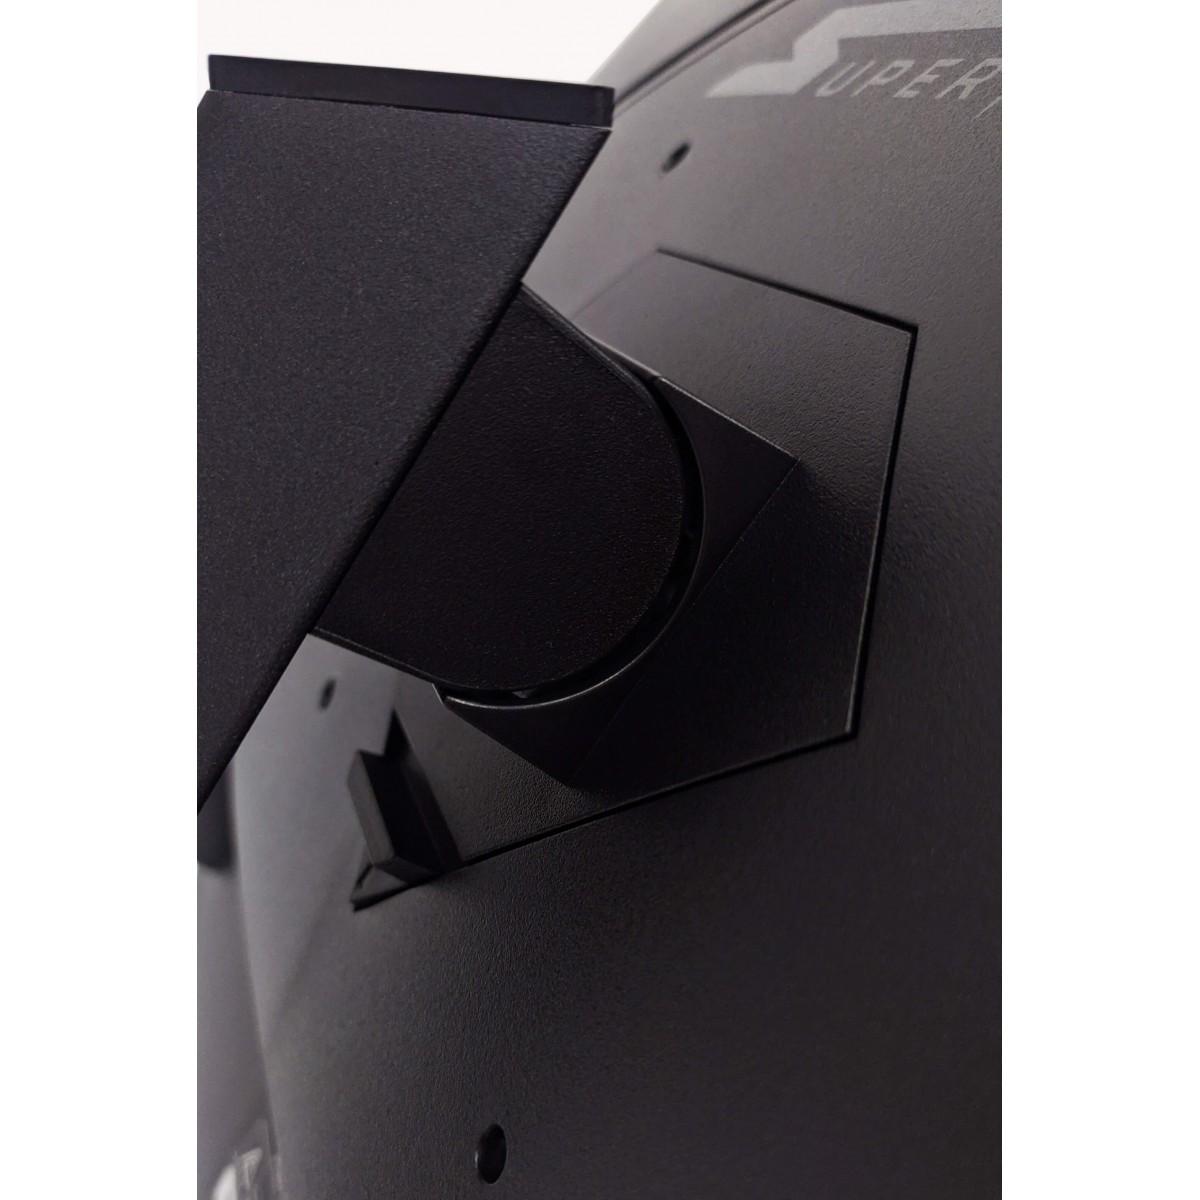 Monitor Gamer SuperFrame Precision, 27 Pol CURVO, Quad HD, FreeSync, 1ms, 165Hz, HDMI/DP, SFV2701G